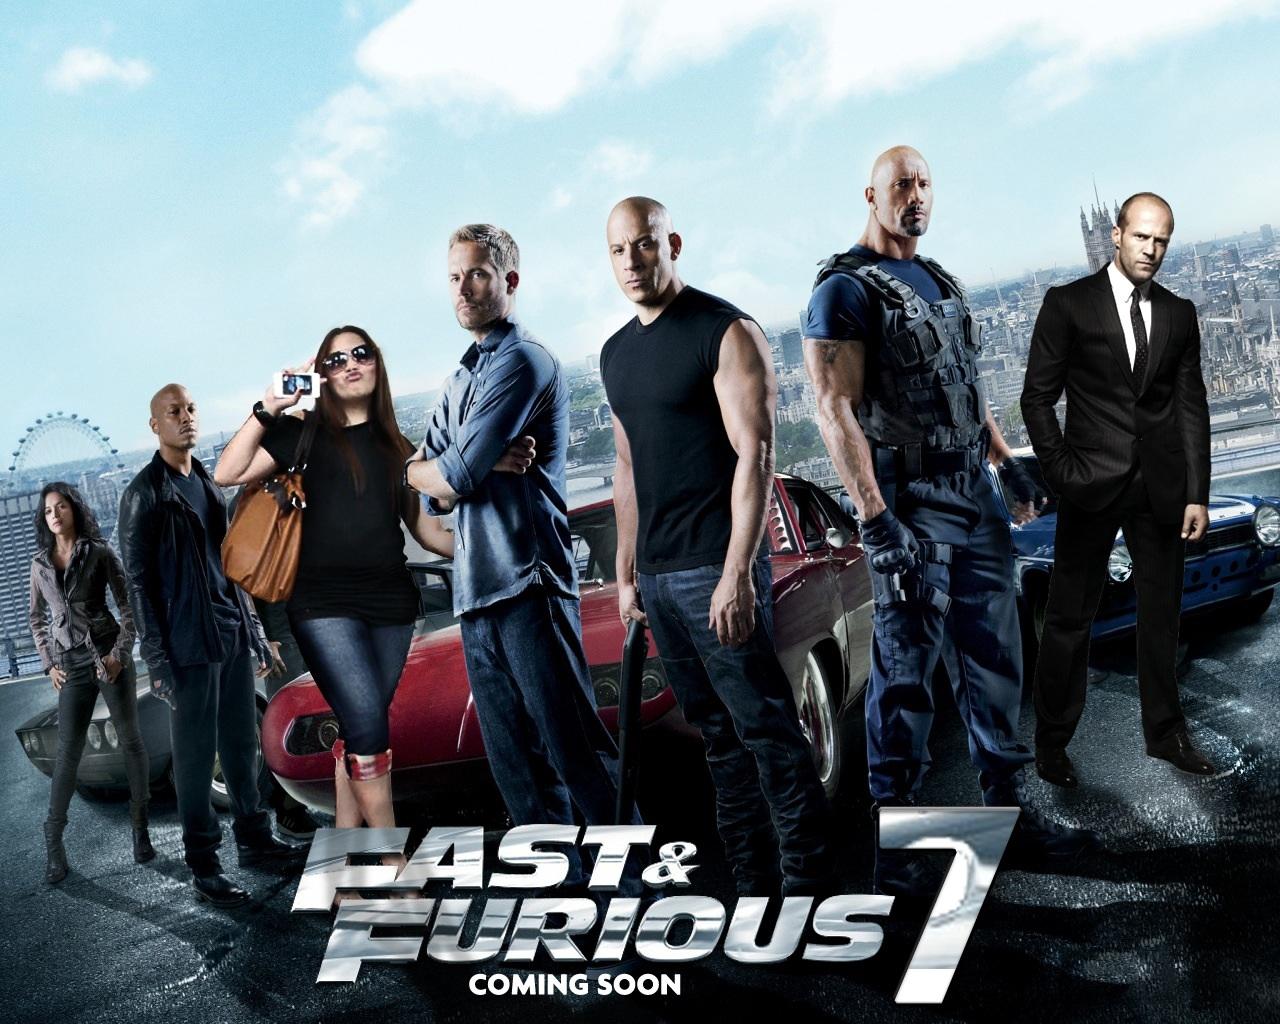 Fast Furious 7 online subtitrat in limba romana - Online